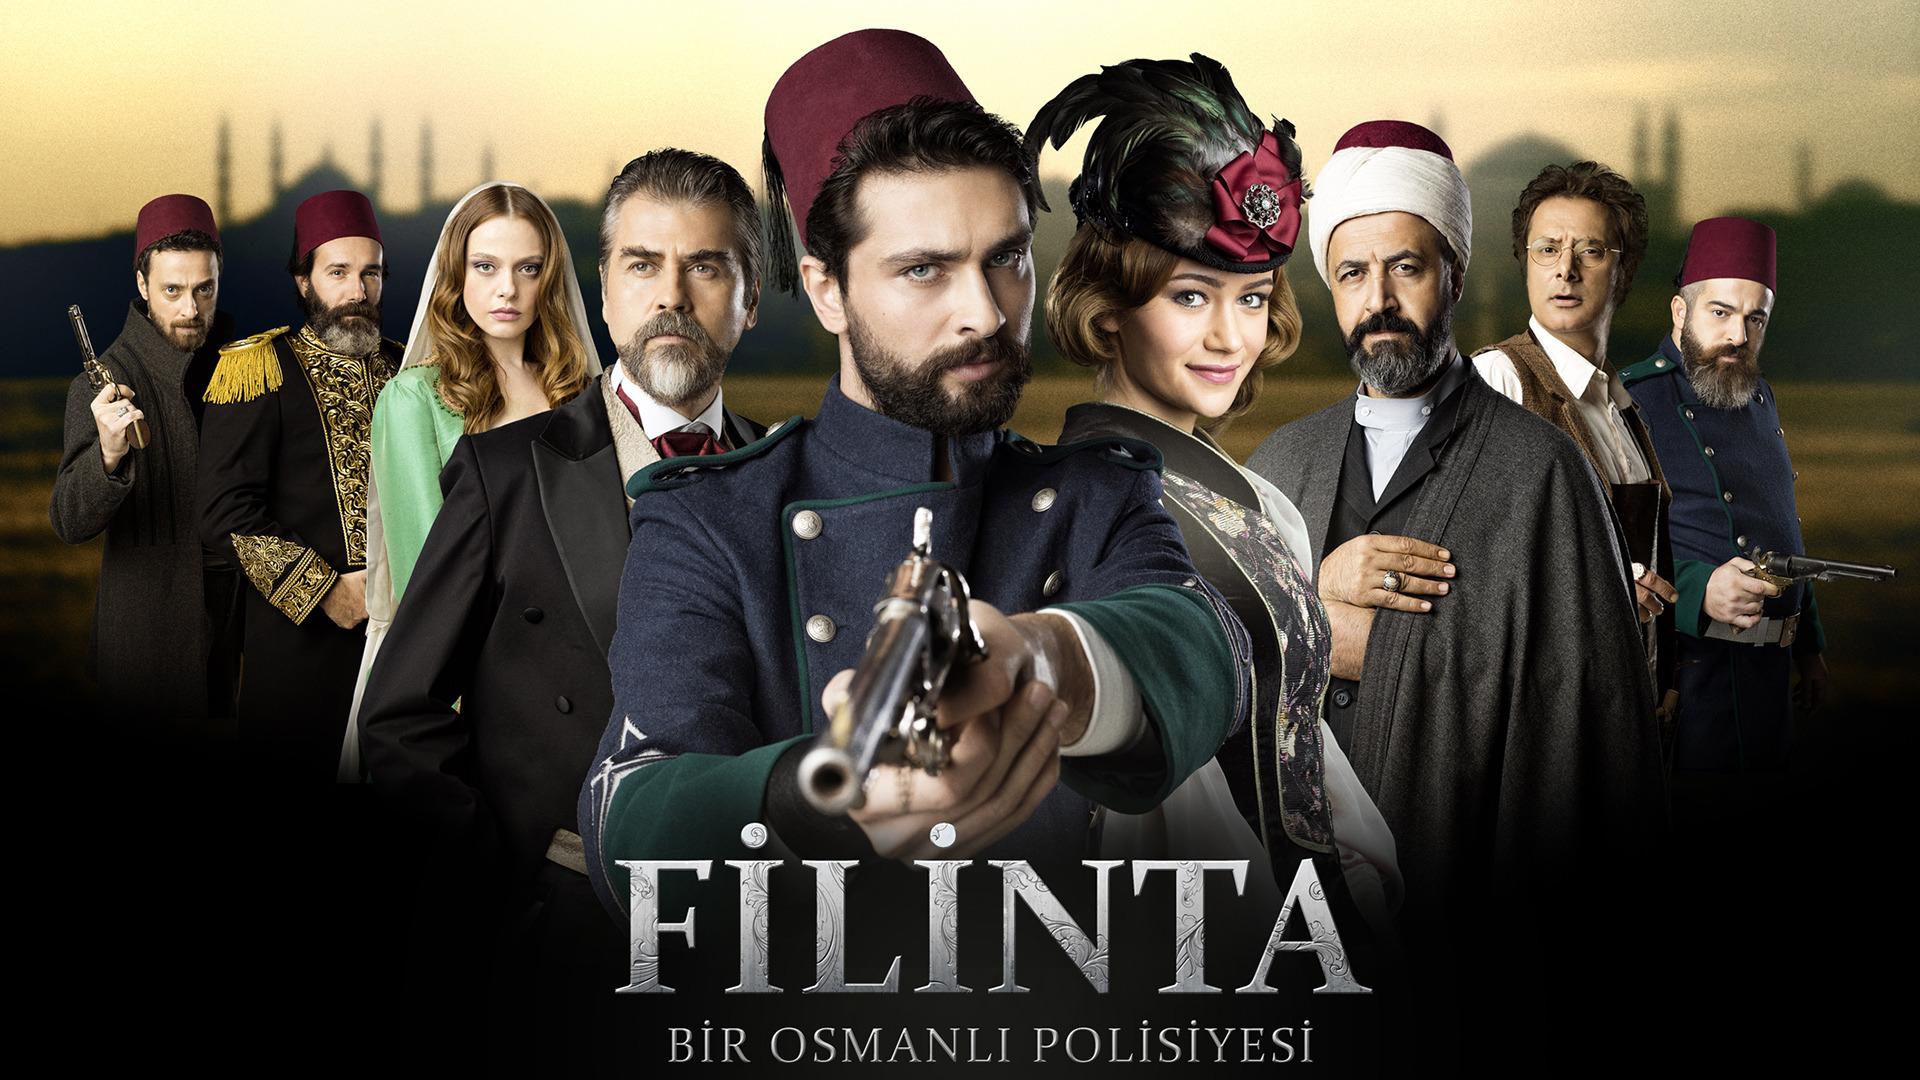 Show Filinta